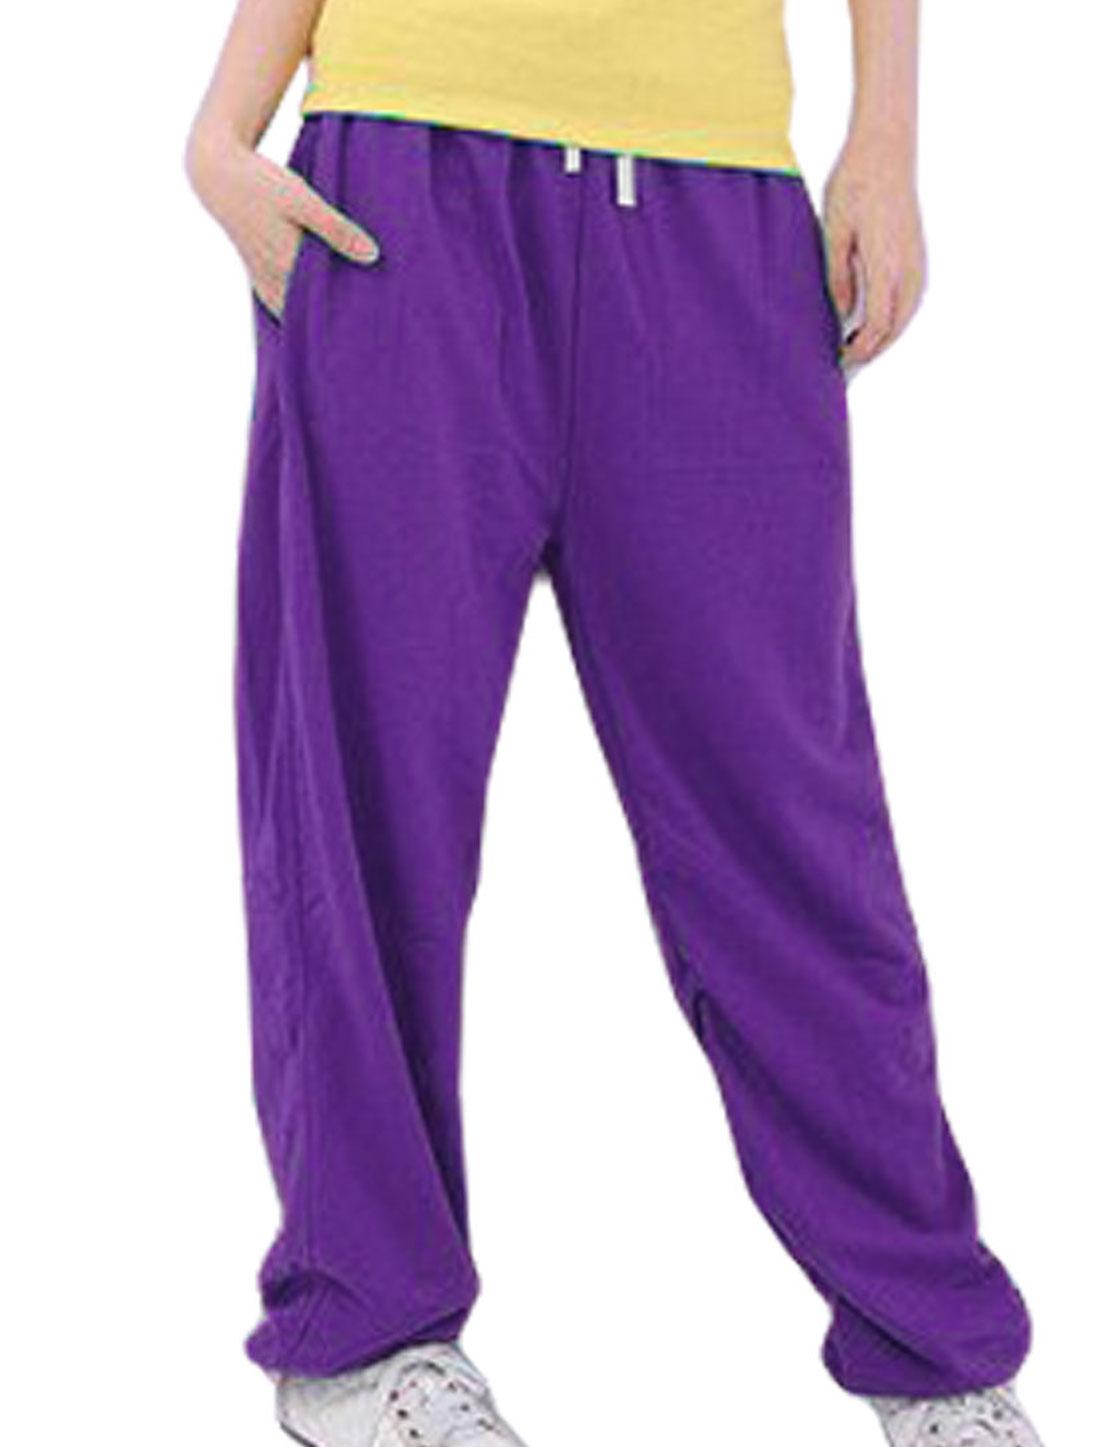 Ladies Purple Drawstring Elastic Waist Seam Pockets Sport Pants S